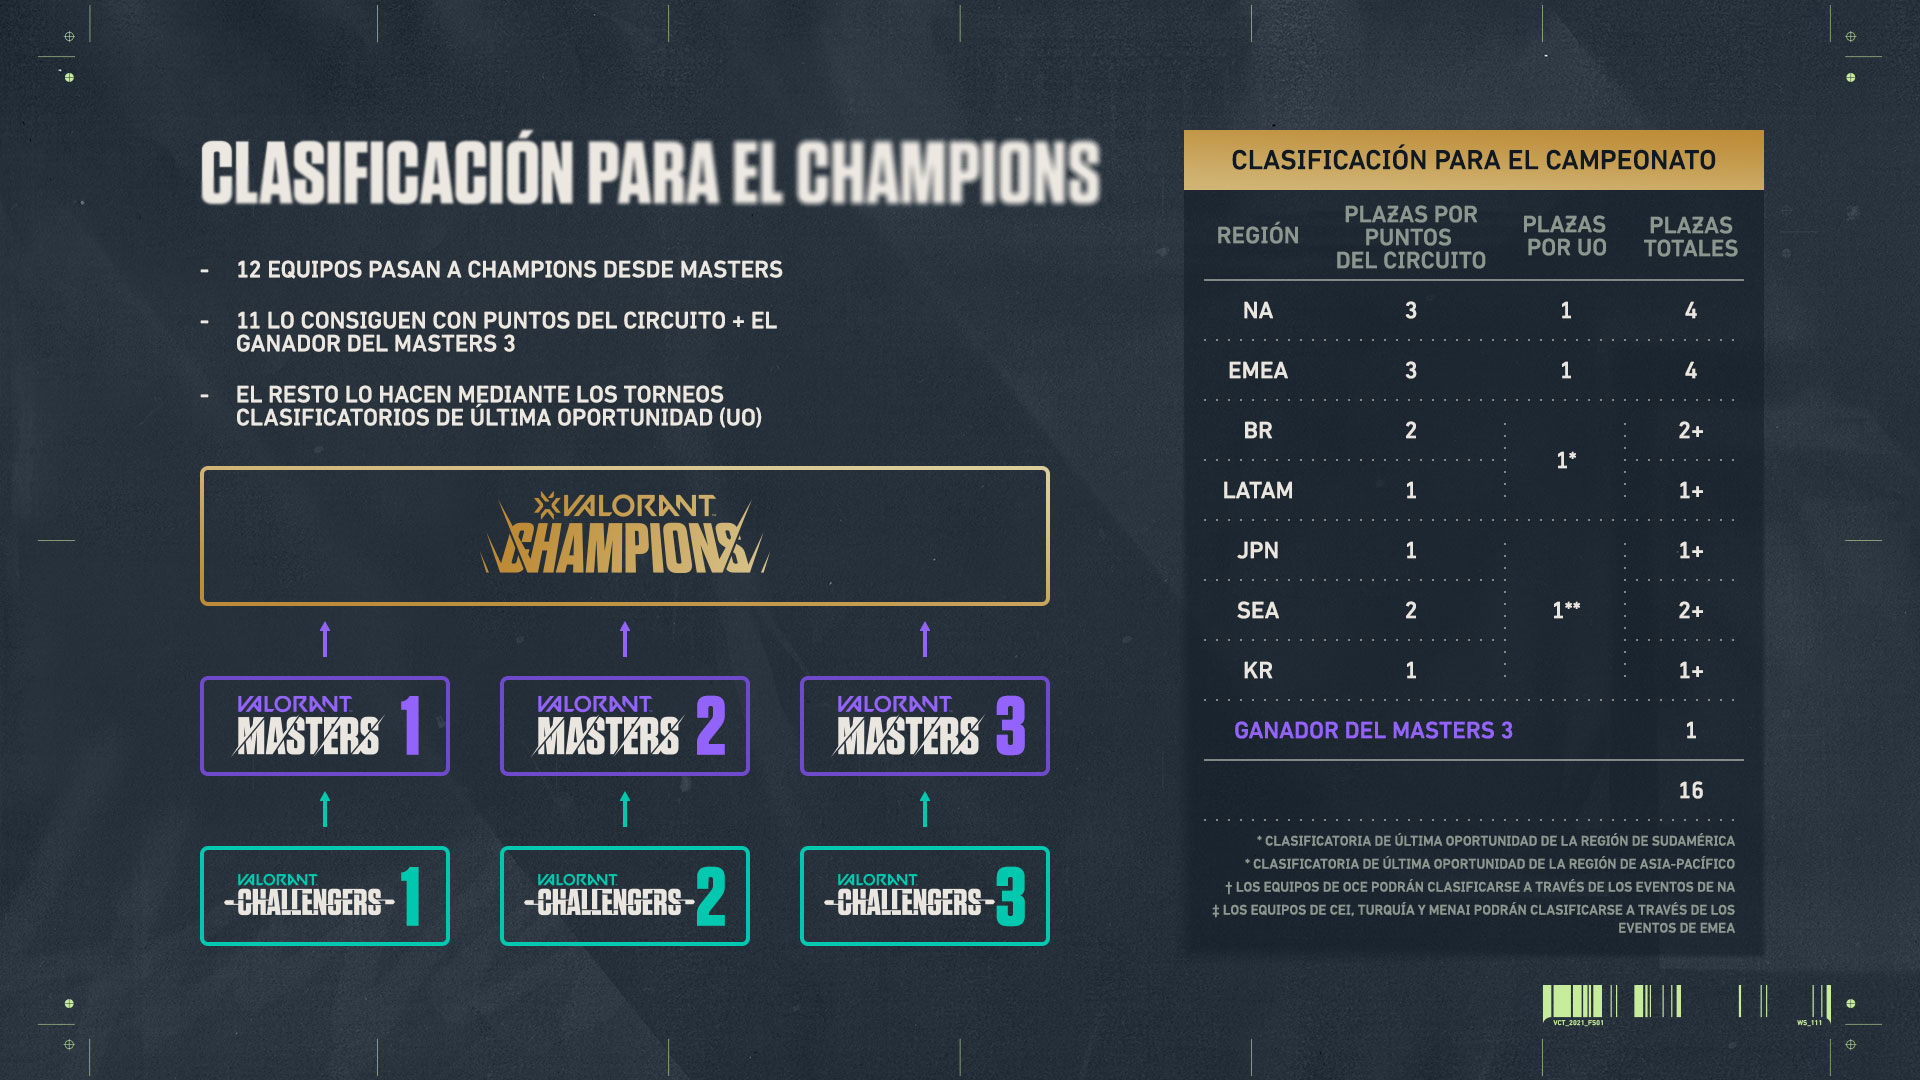 es-es_es-es_Copy-of-04-championsqualification-v1.0.jpg